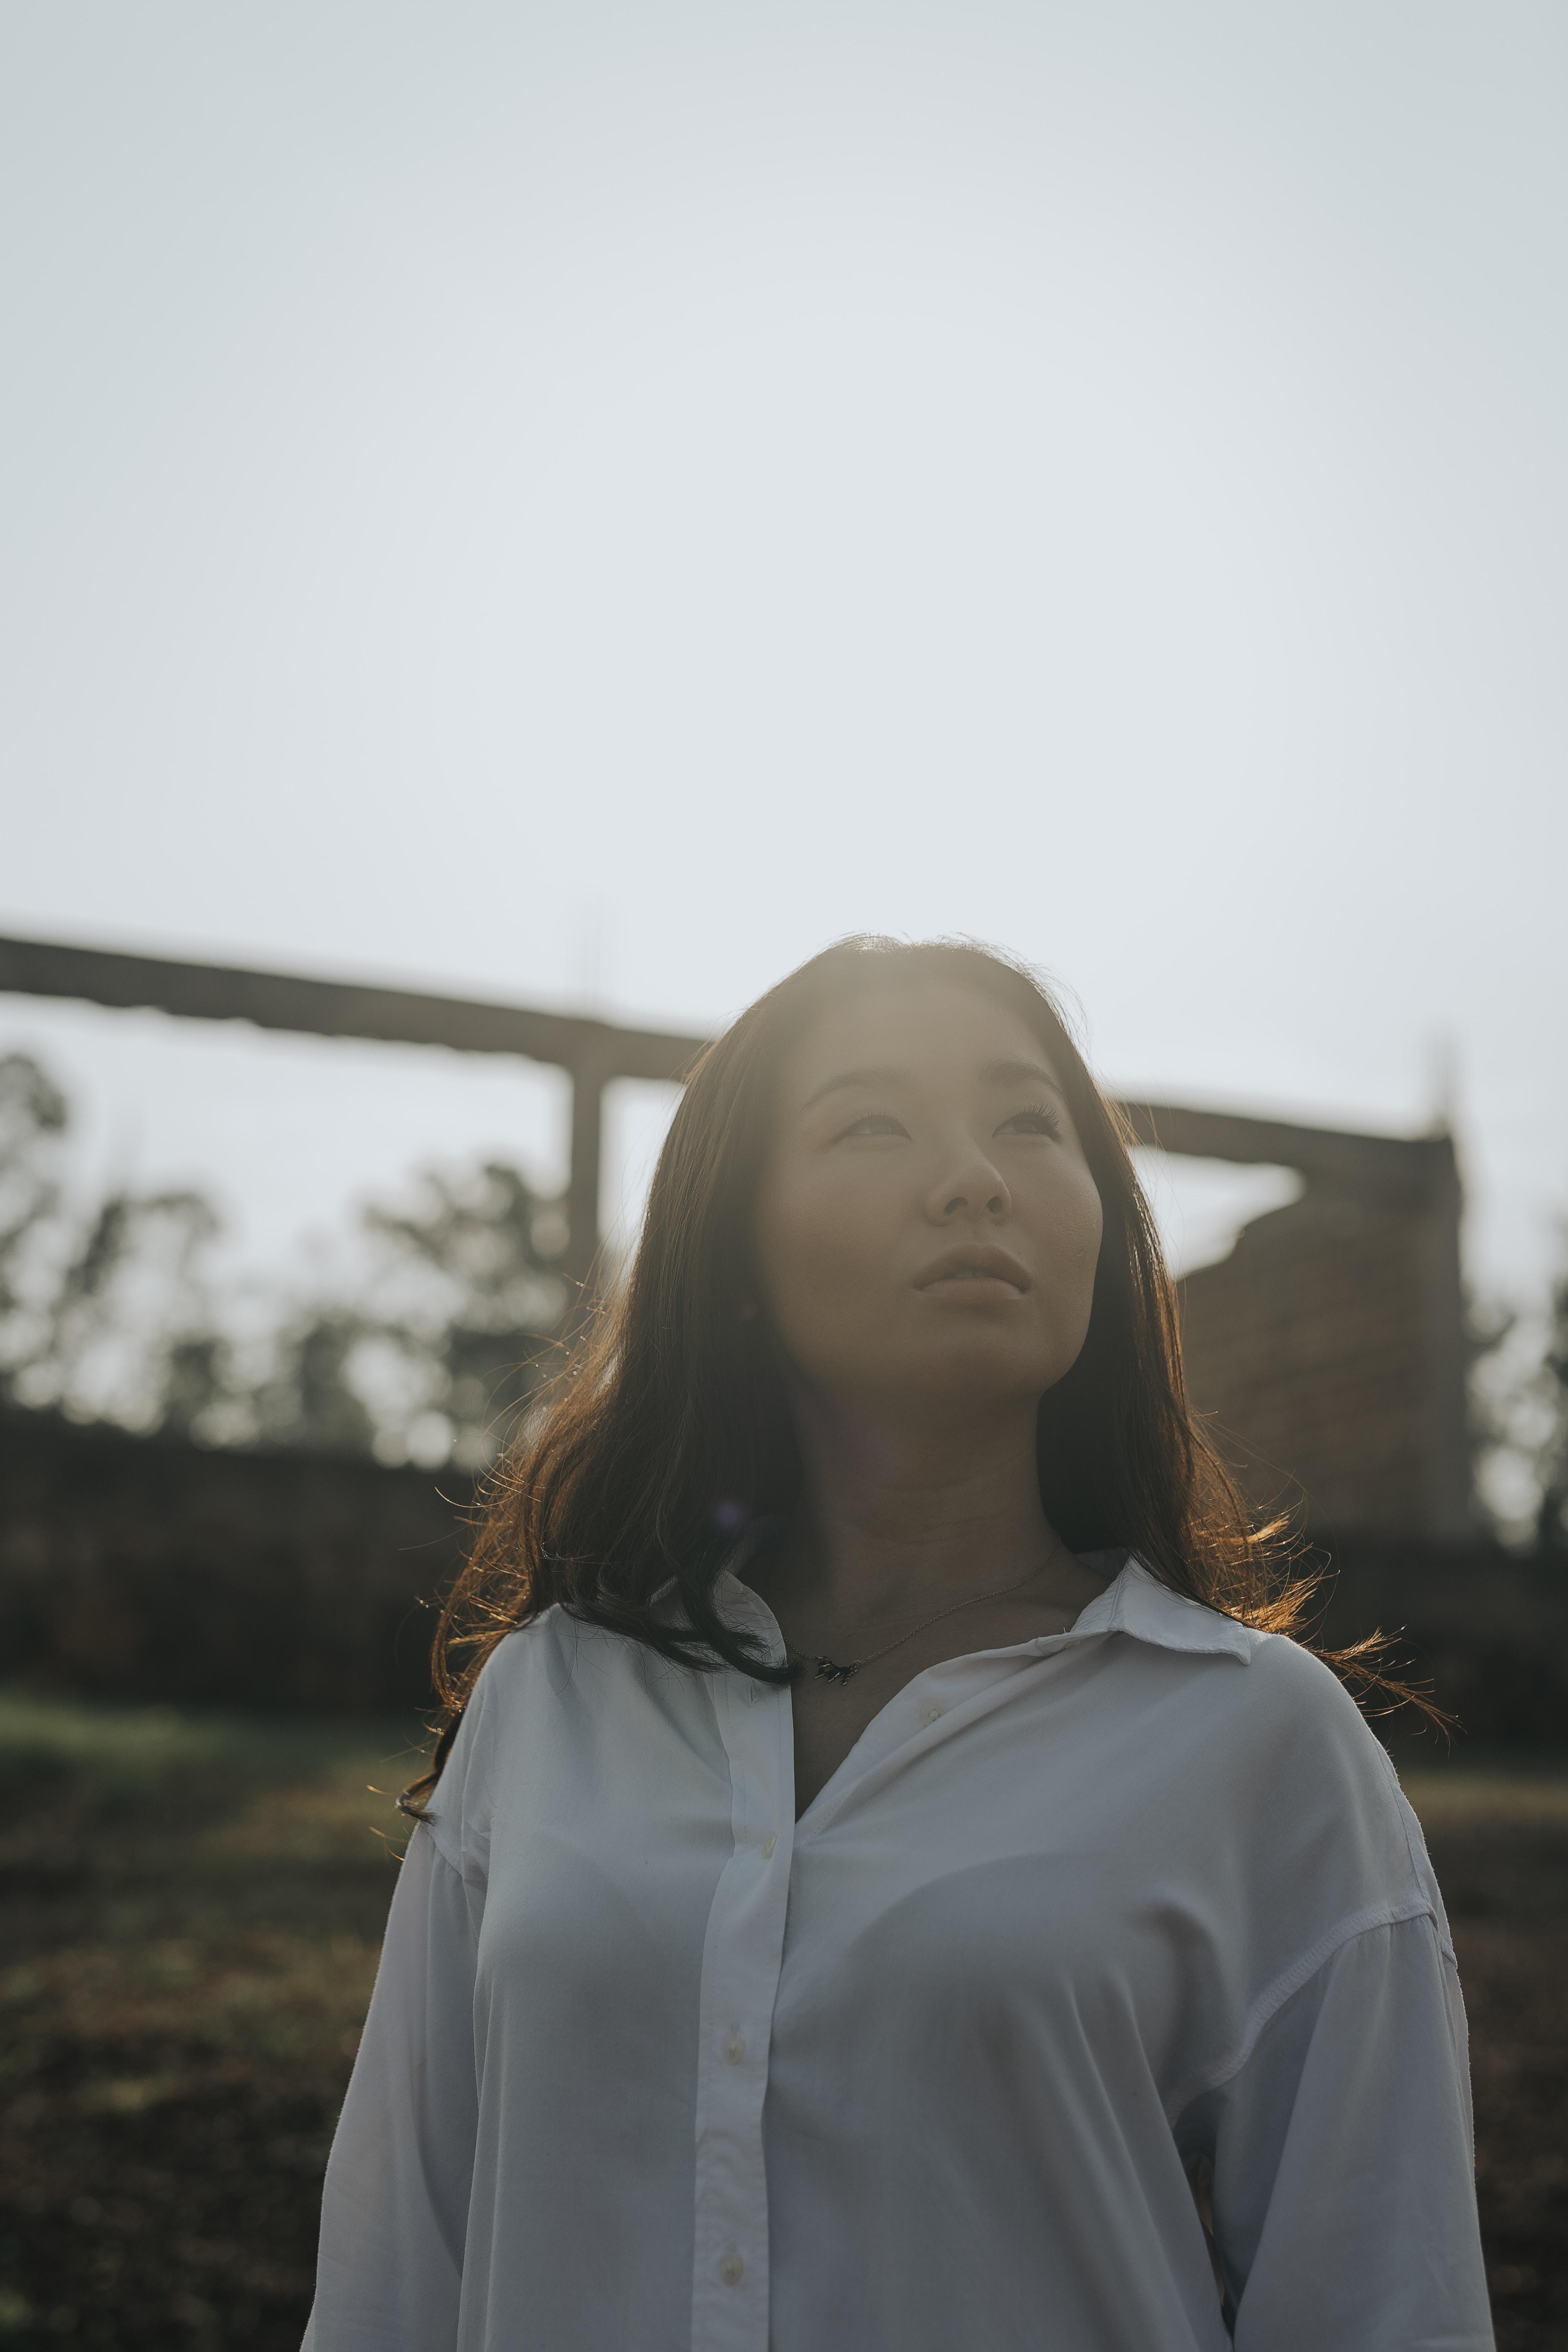 woman wearing white dress shirt looking up